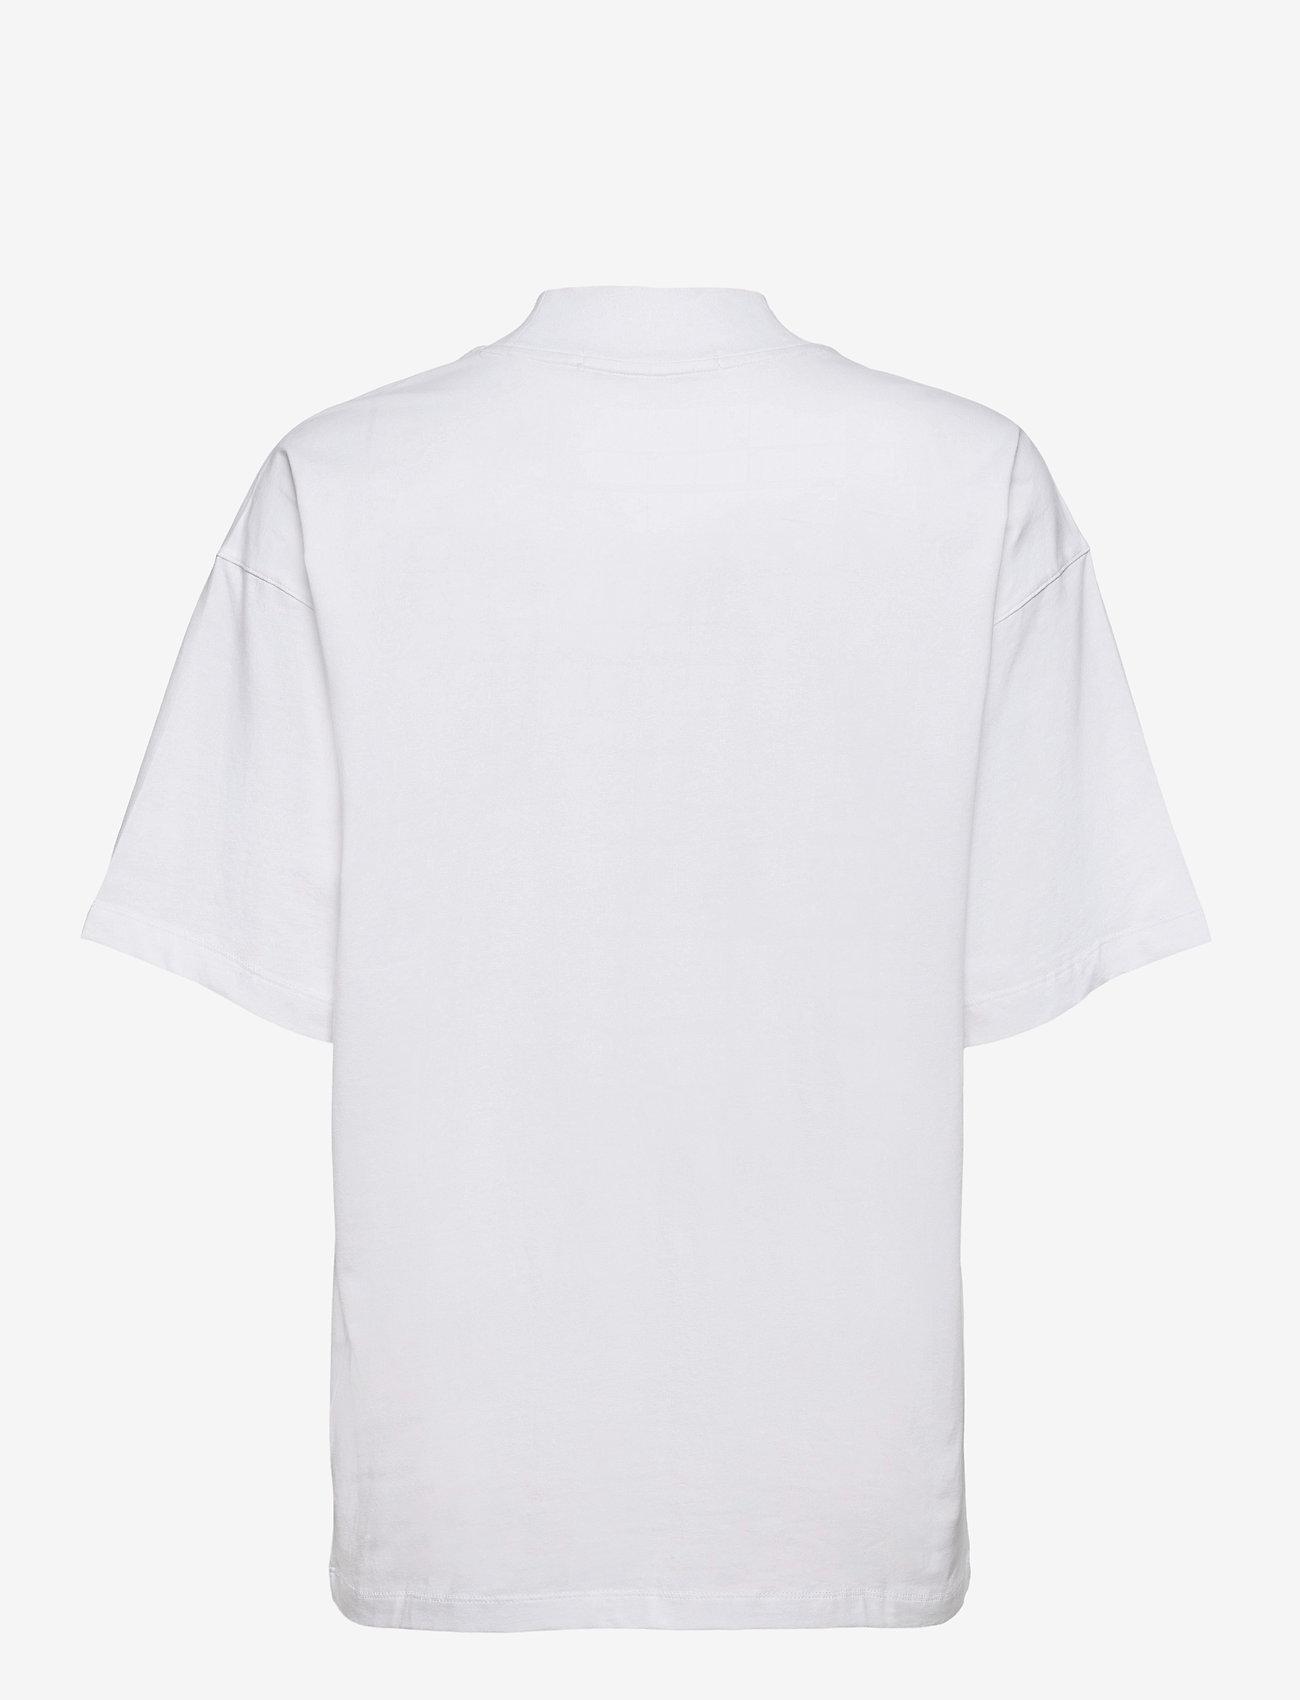 Calvin Klein Jeans - UNISEX MICRO BRANDING MOCK NECK - basic t-shirts - bright white - 1